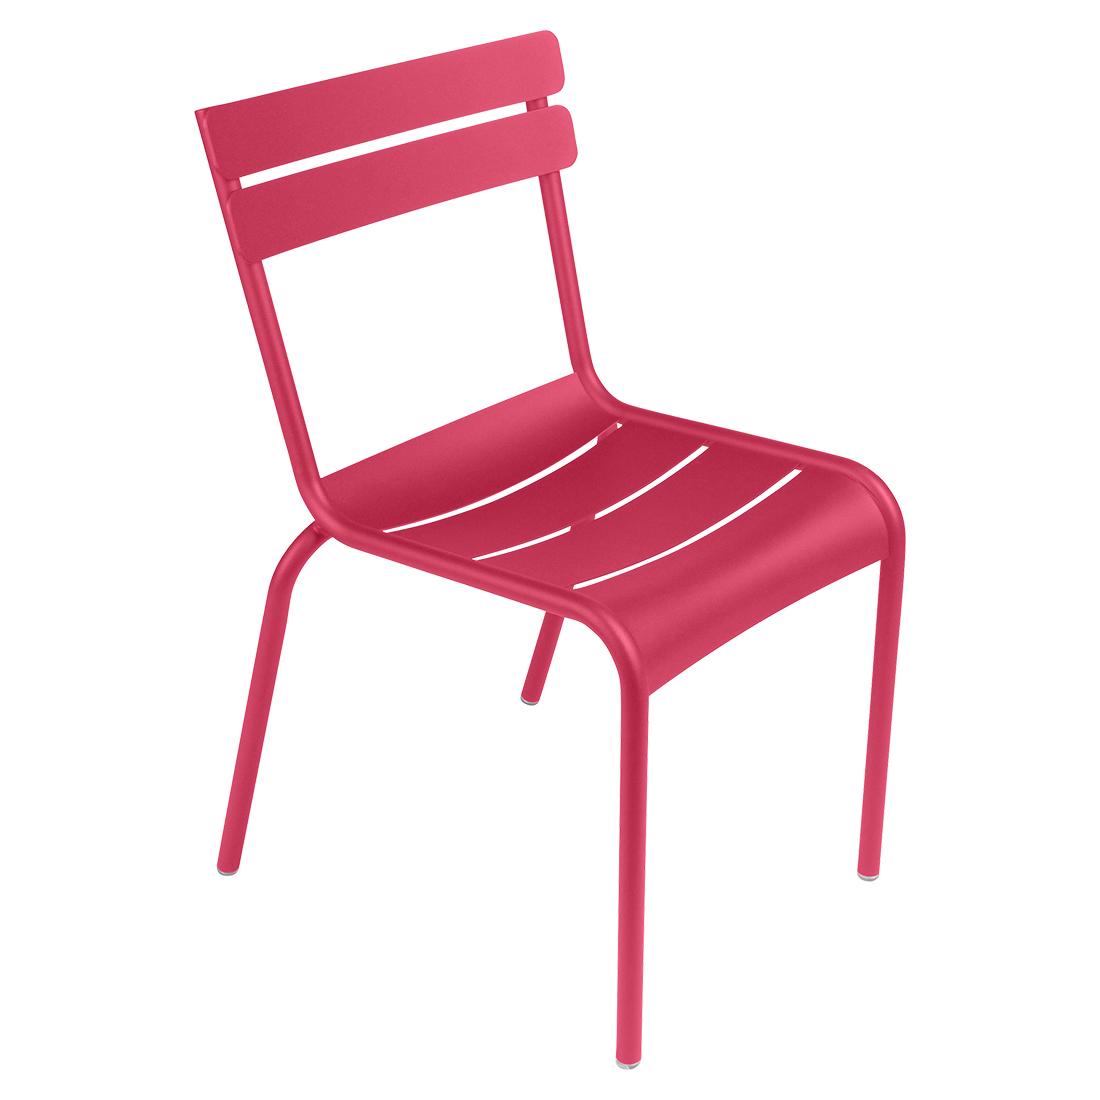 Fermob Luxembourg Stuhl Rose Praline 93 NEU Stuhl ohne Armlehnen